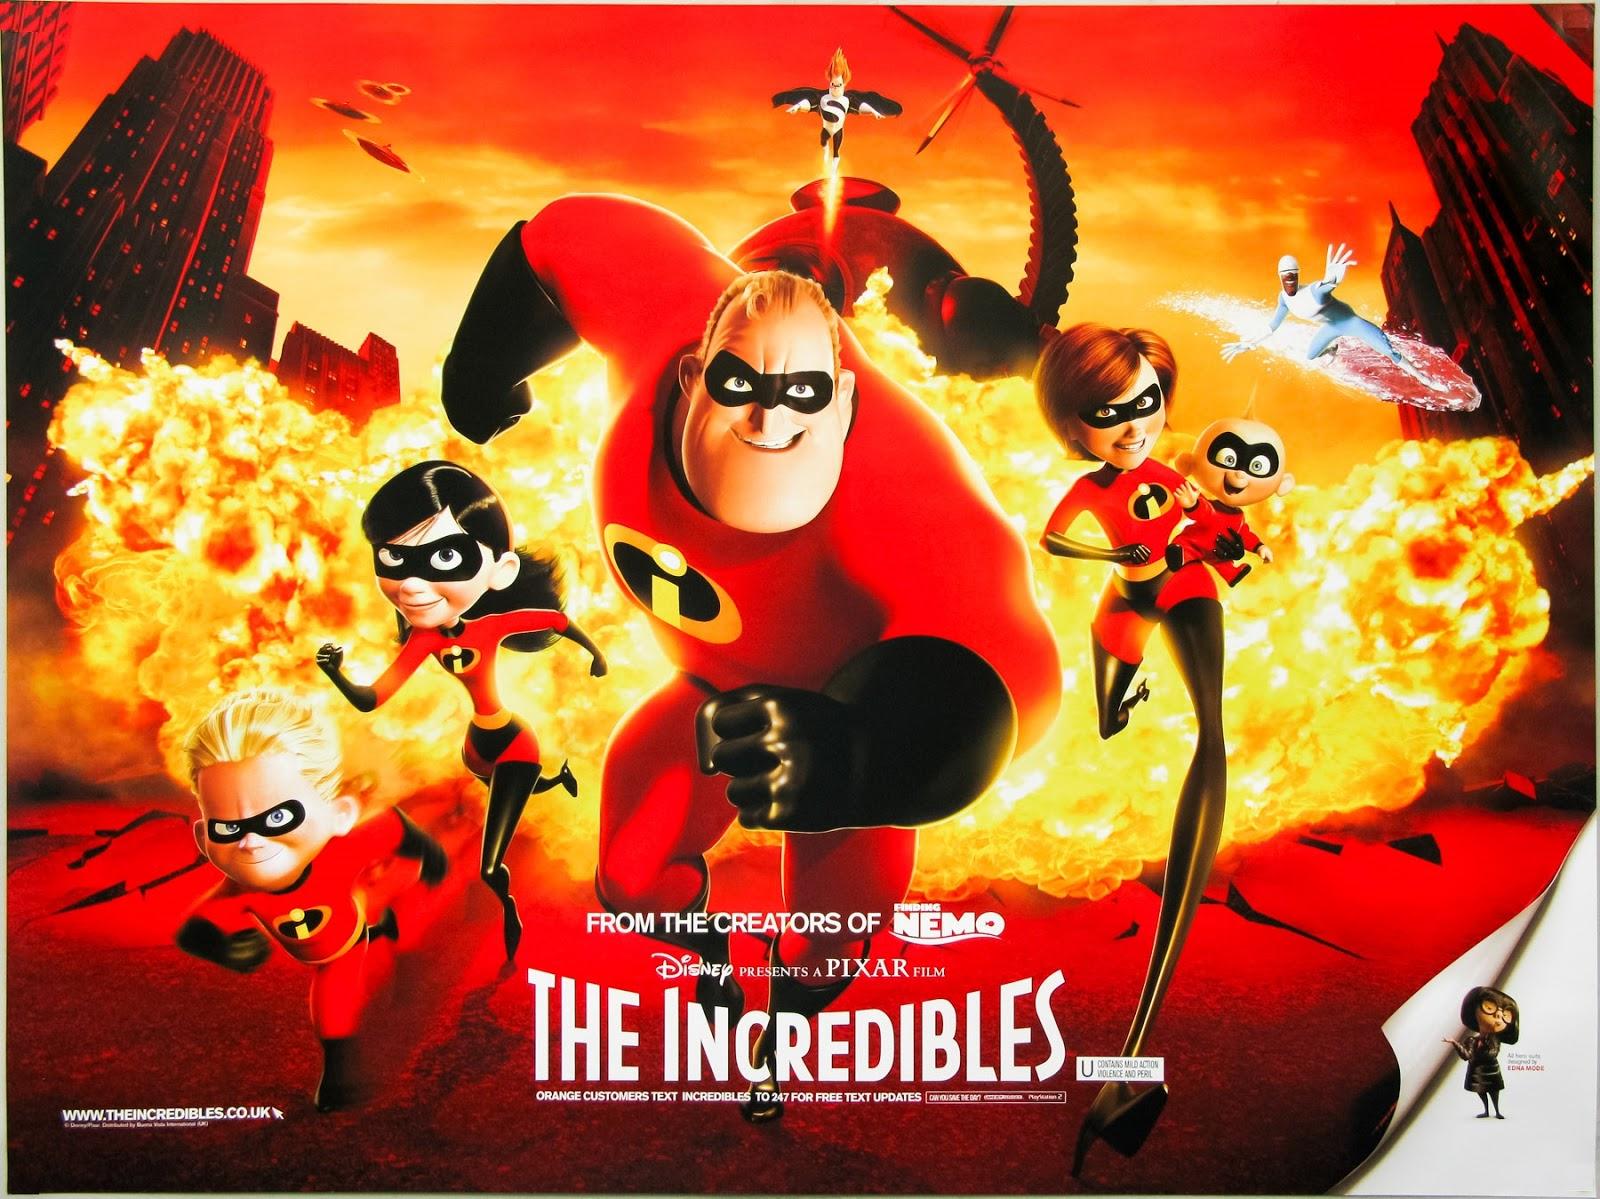 David S Cave My Favorite Films The Incredibles 2004 Saturday Evening Cartoons